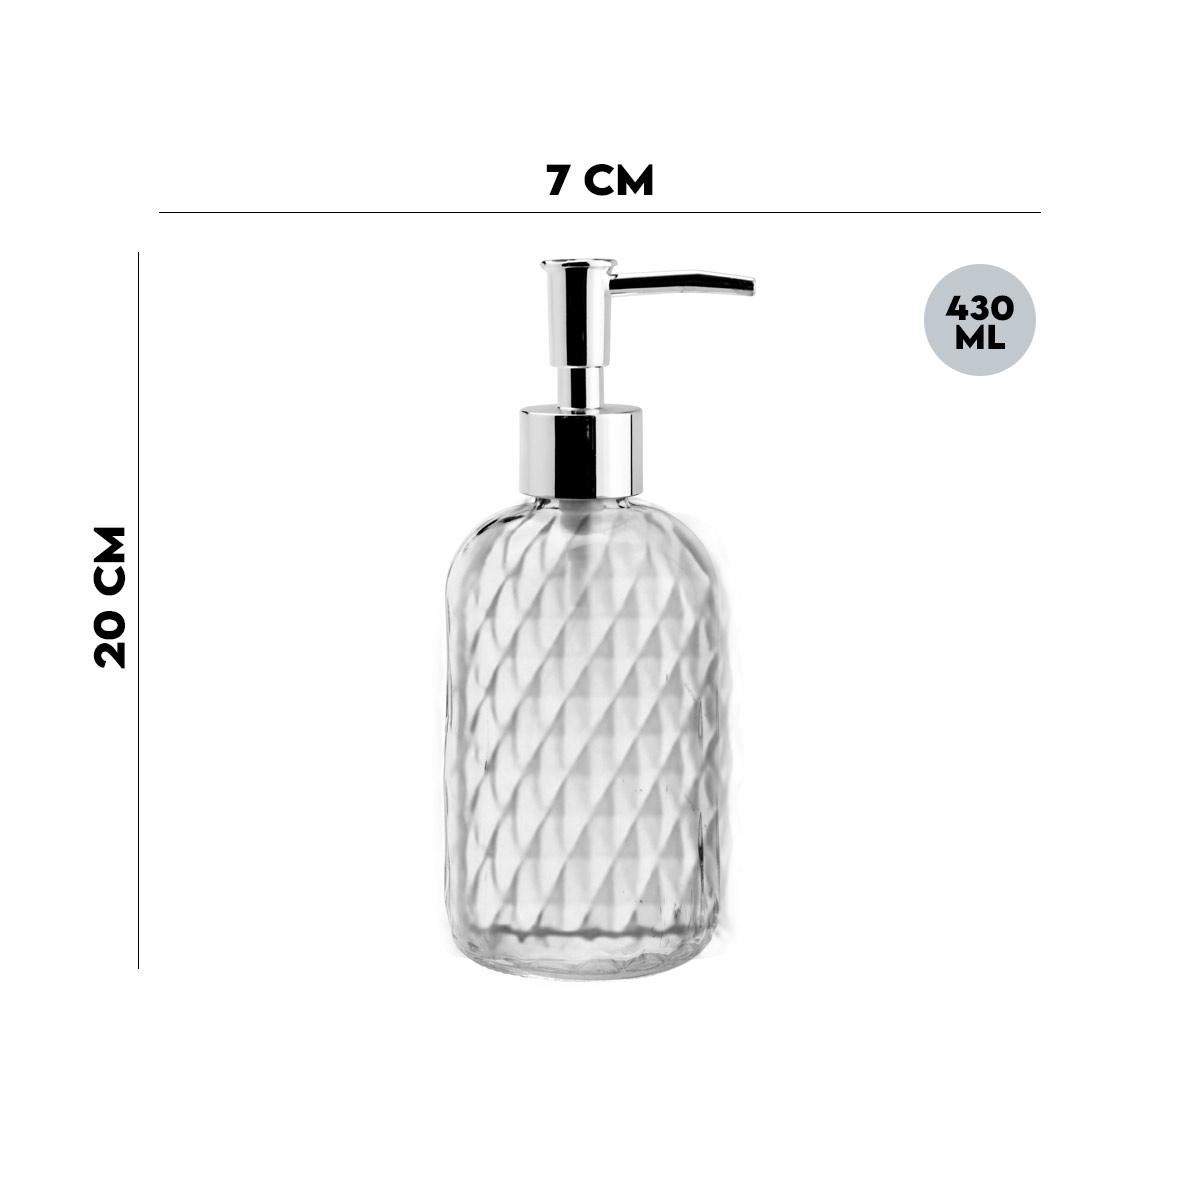 Porta Sabonete Liquido de Vidro Sodo Cálcico Bico de Abacaxi 430ml Lyor  - Lemis